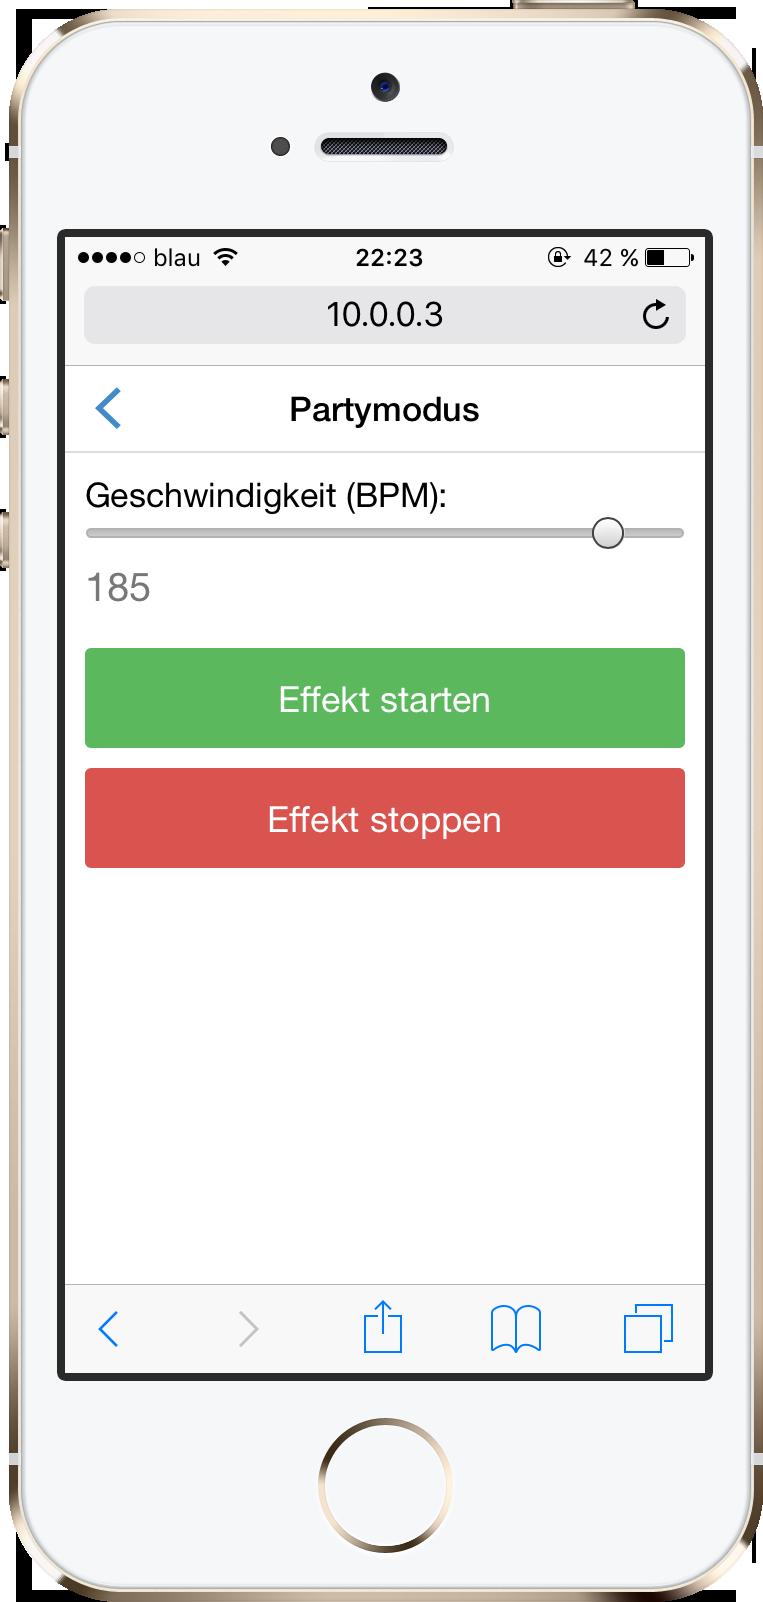 Web-App Partymodus